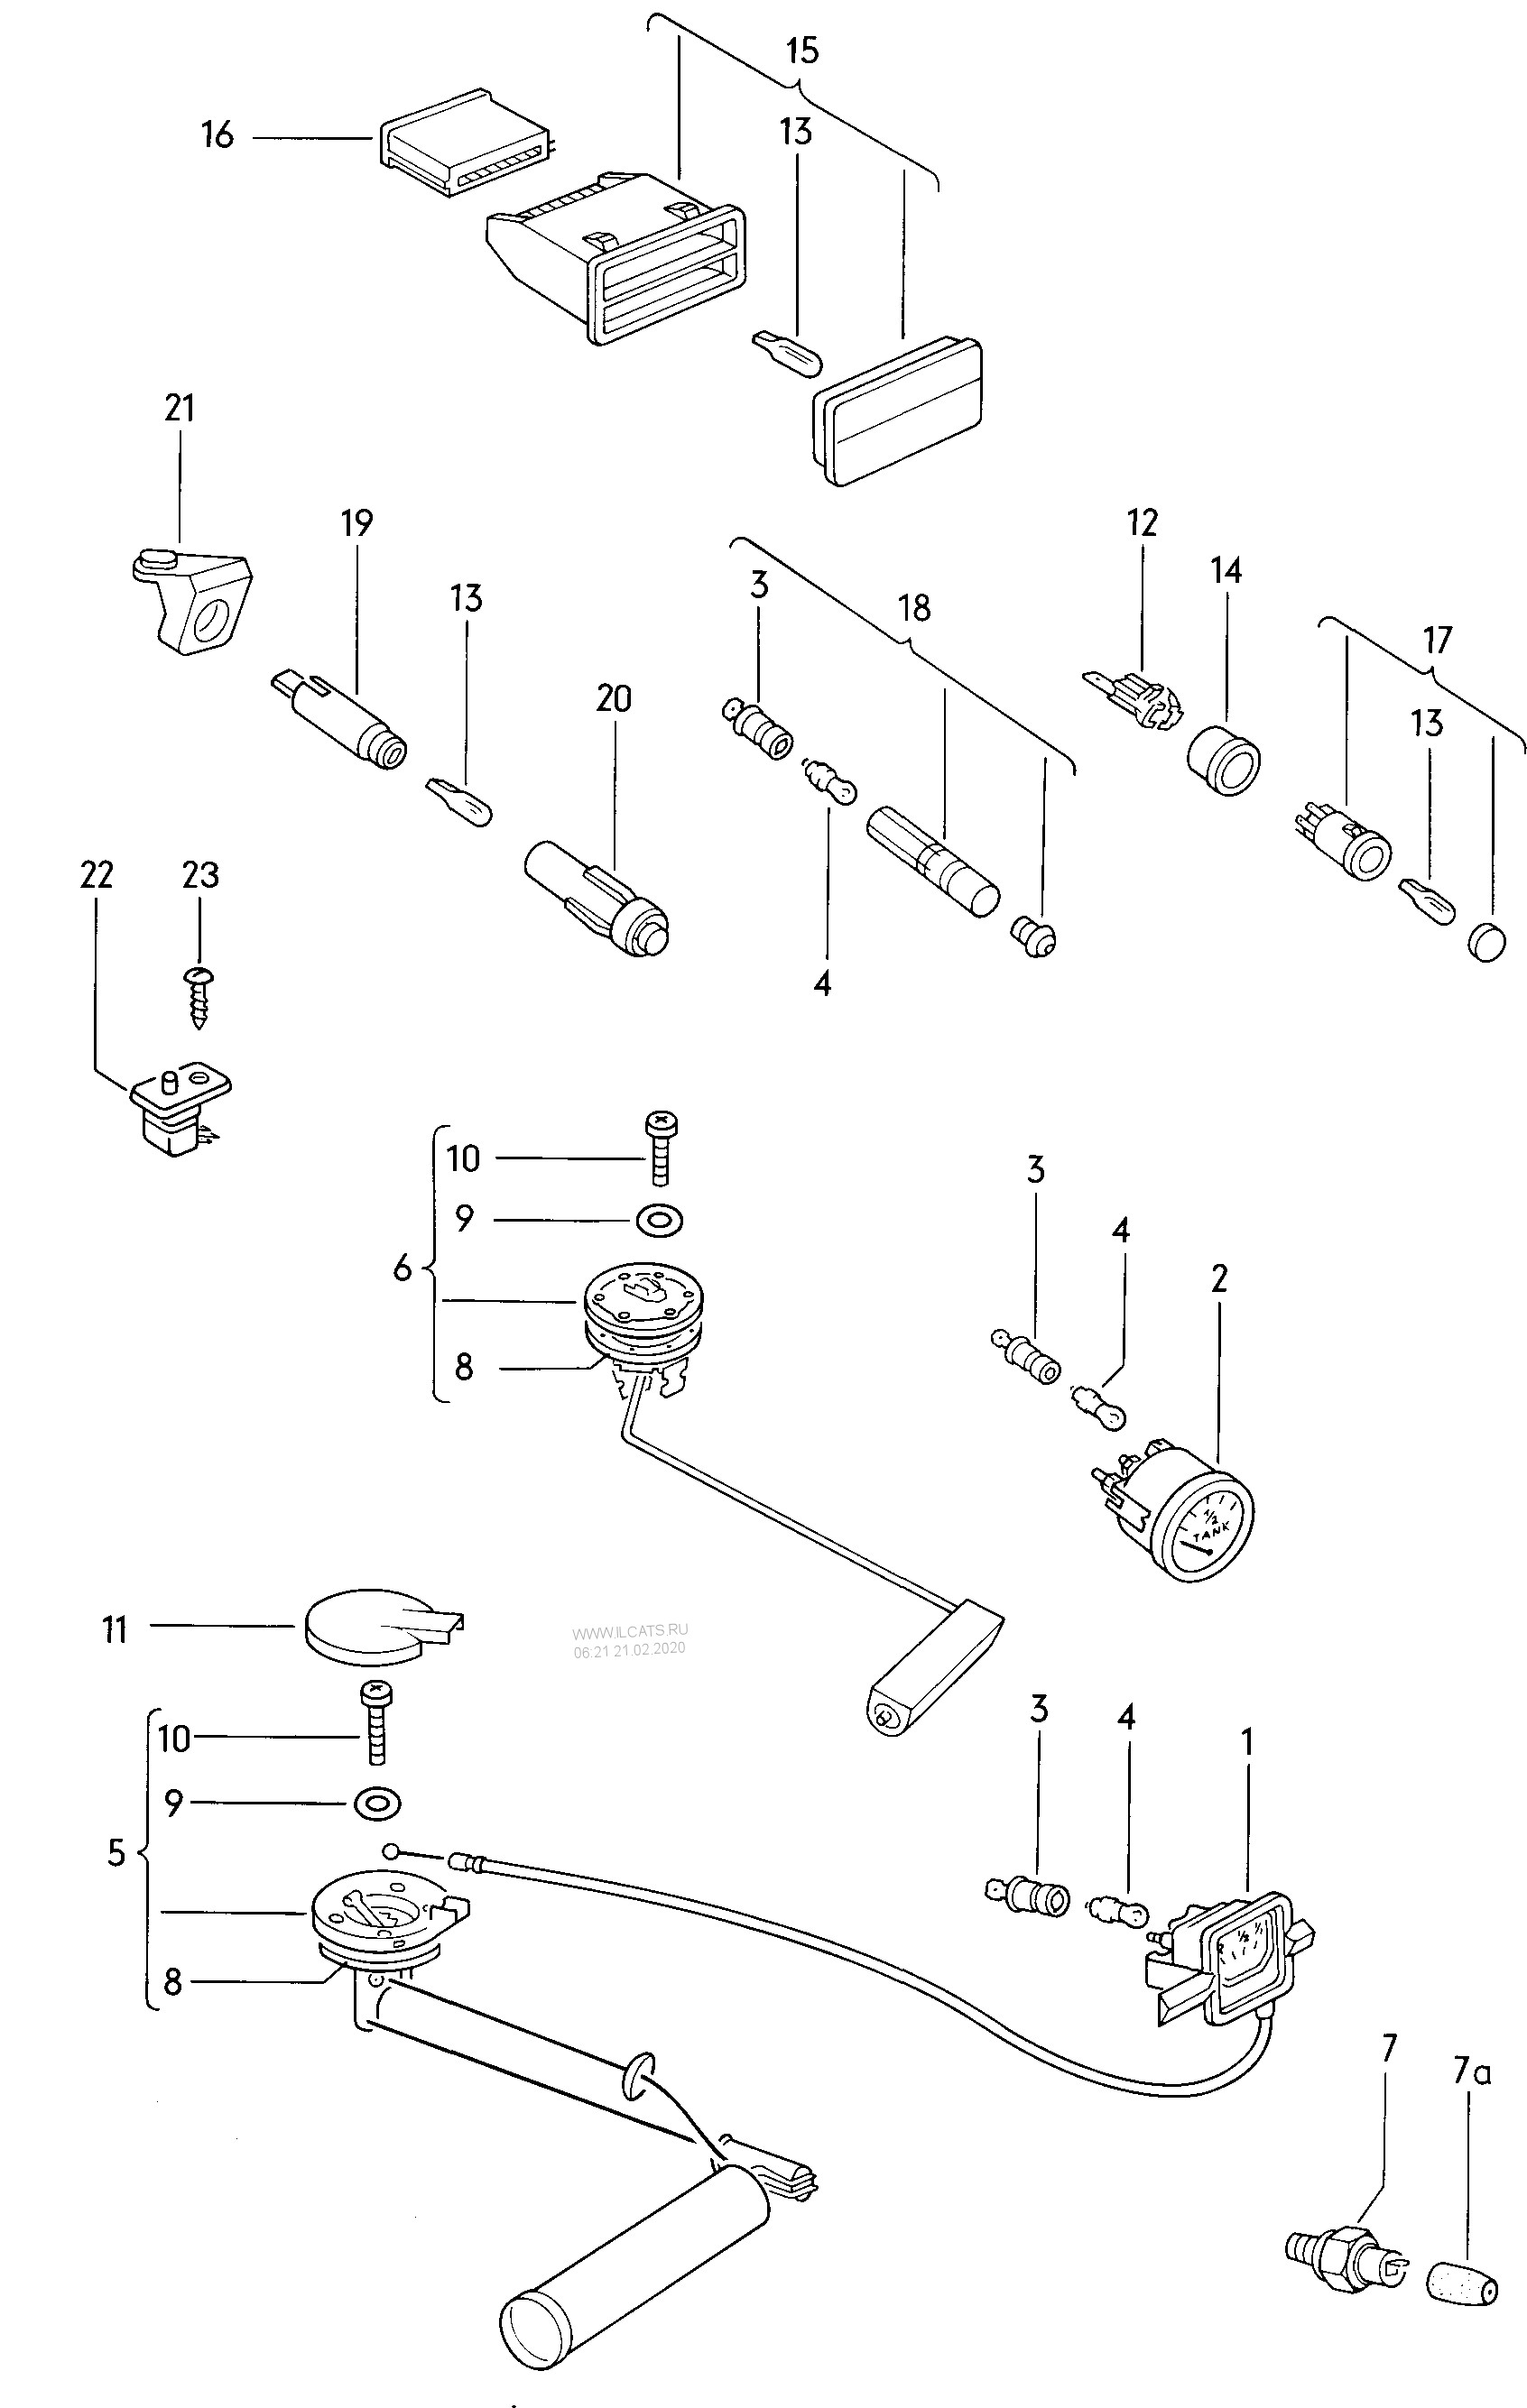 Diagram  Oil Pressure Warning Light Wiring Diagram Full